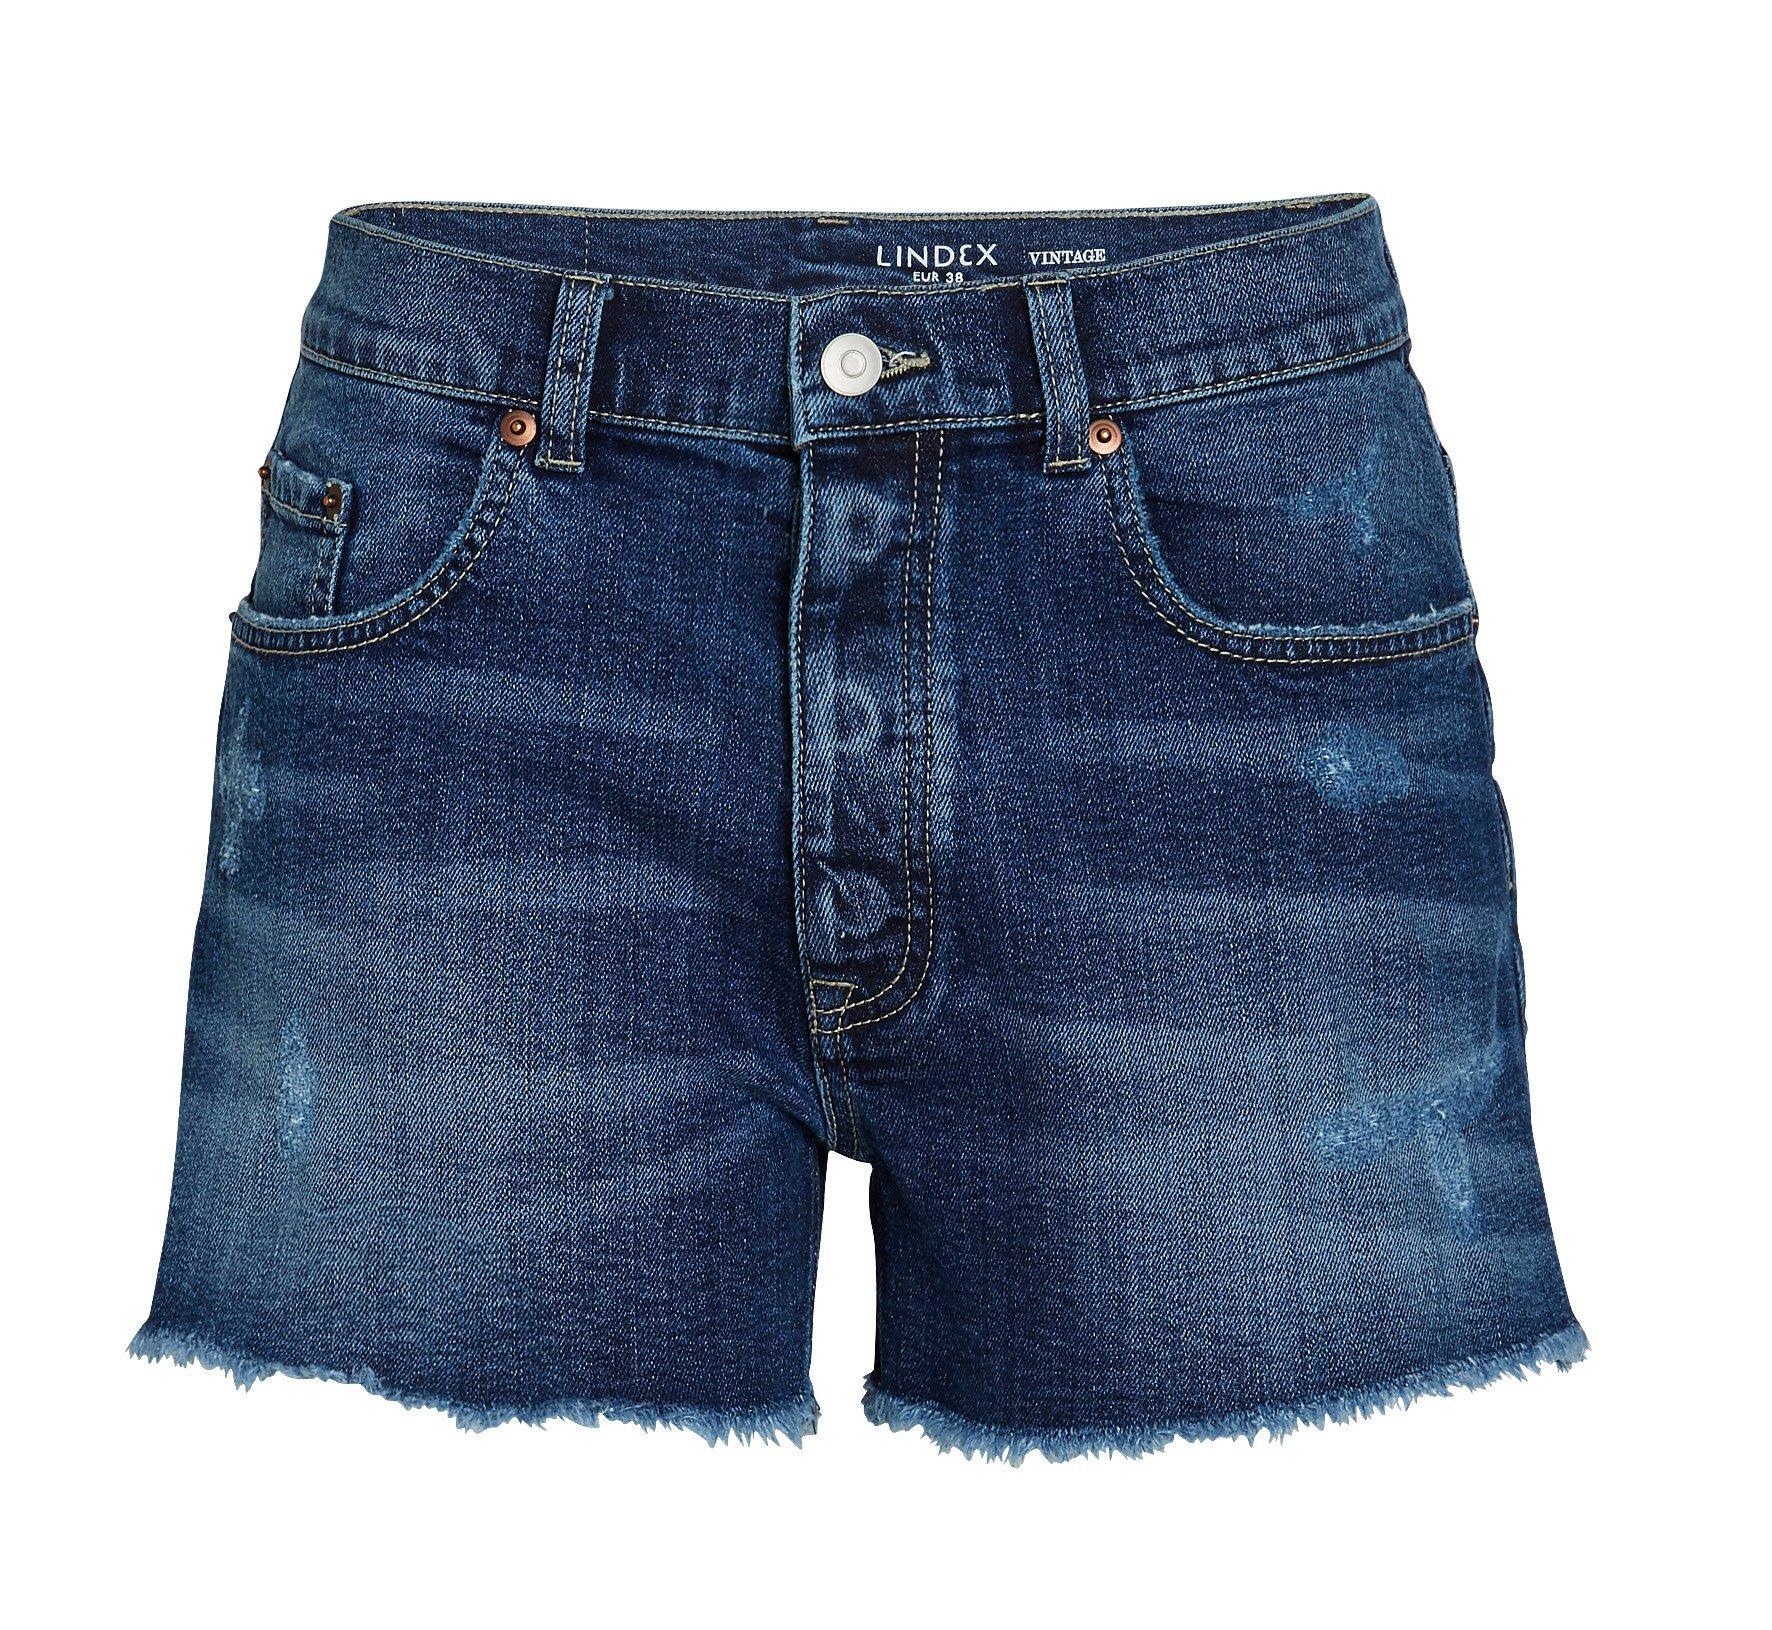 Vintage jeansshorts